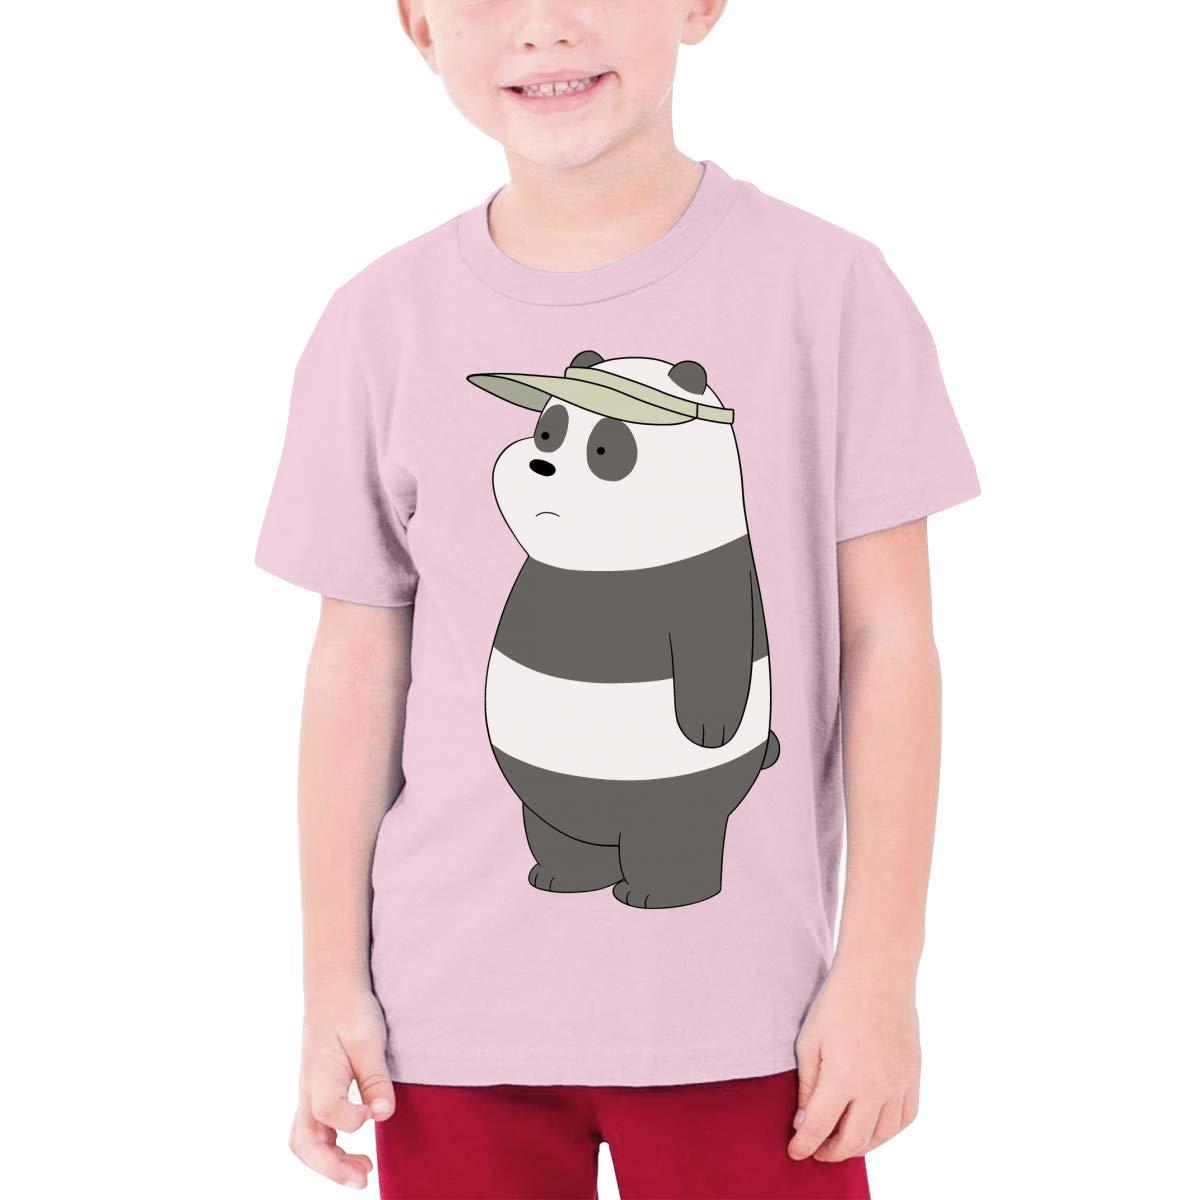 Juwuwenhuachua Design We Bare Bears Funny T Shirt O-Neck for Teenagers Black